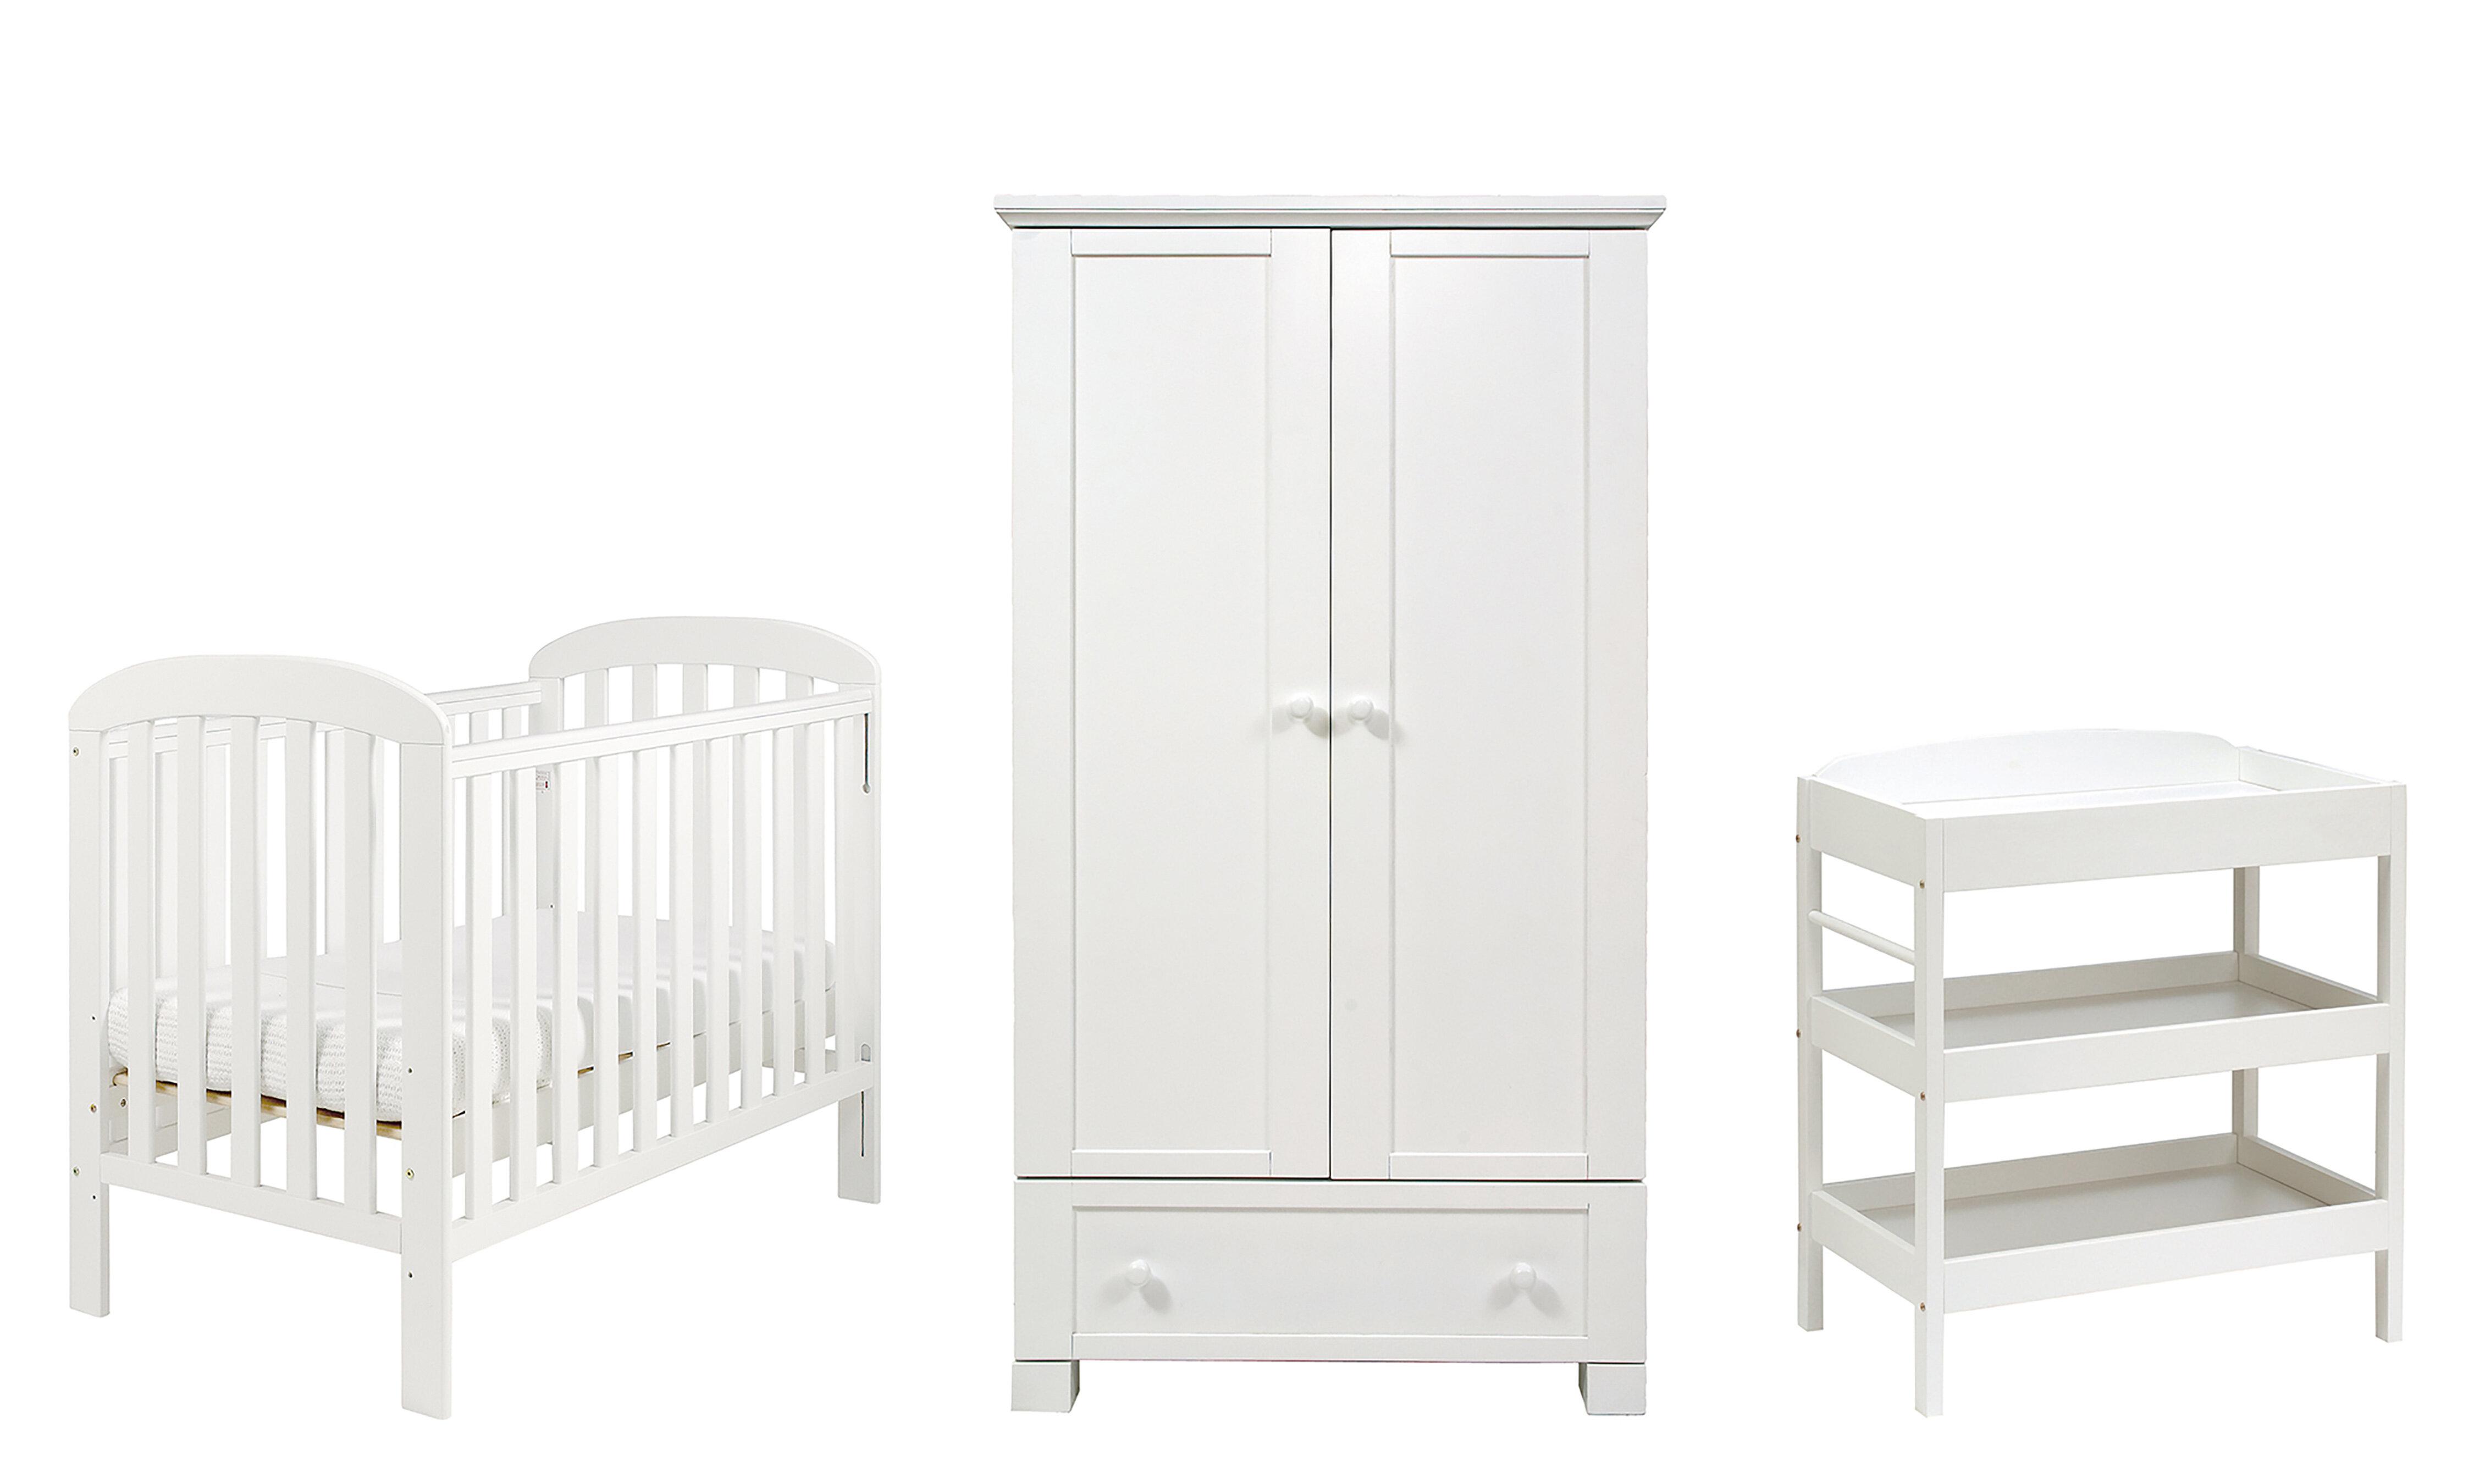 Nala Cot 3 Piece Nursery Furniture Set